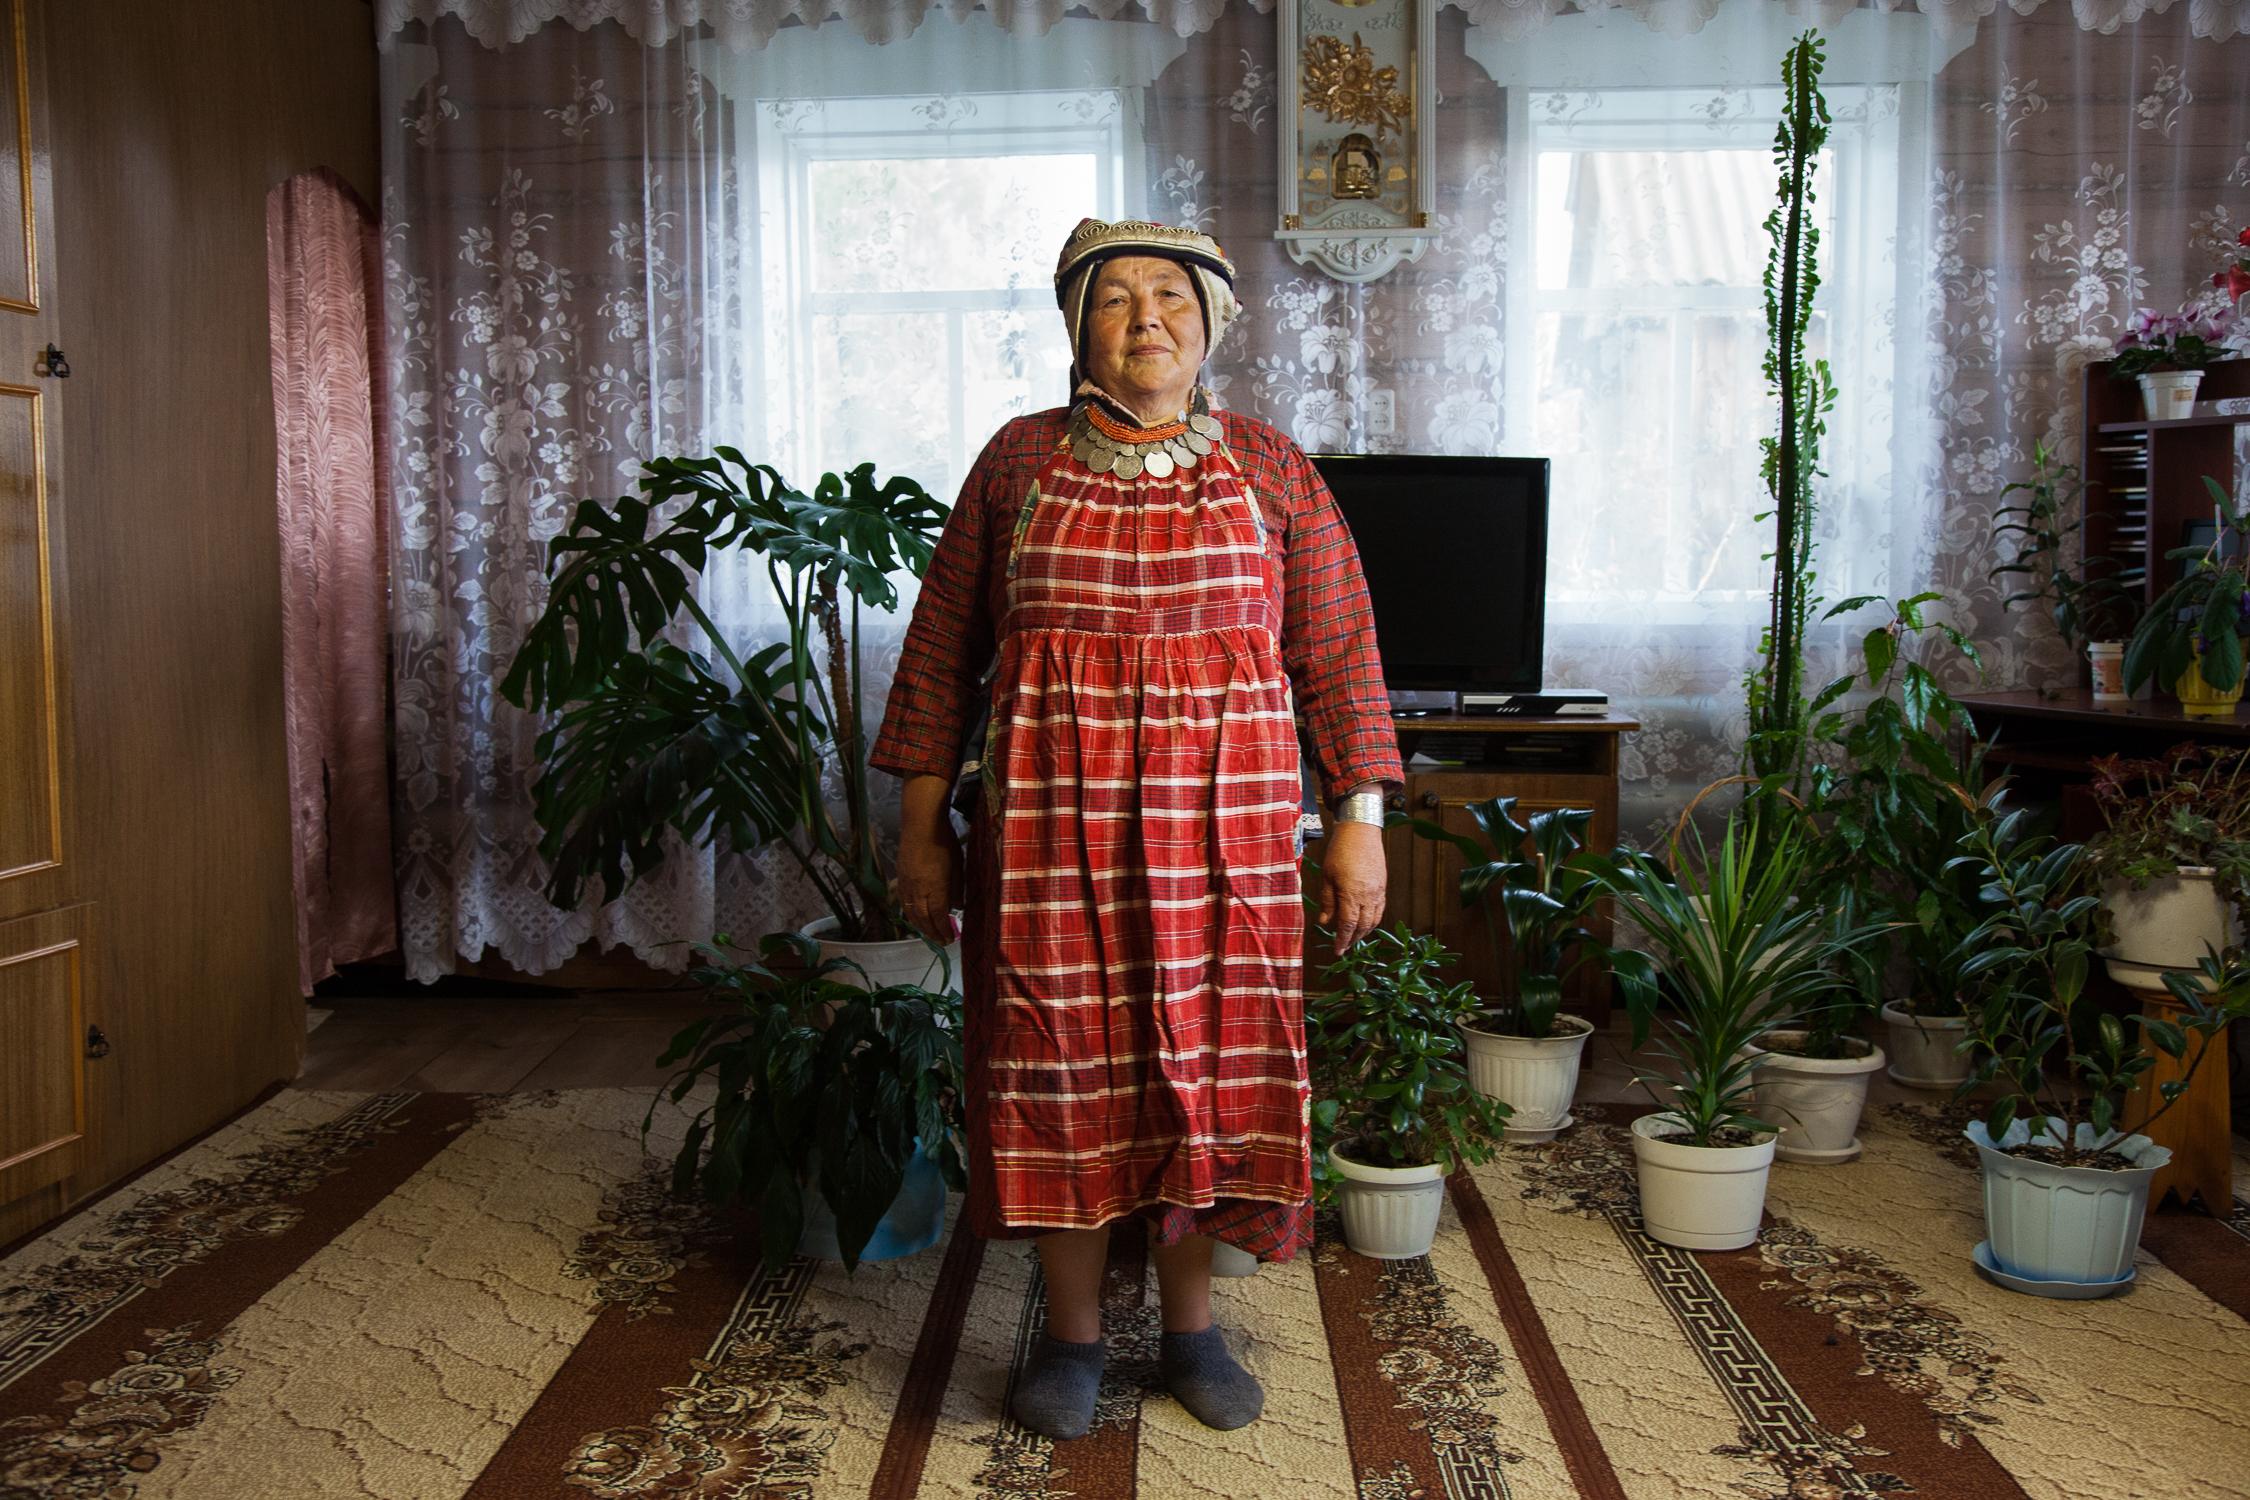 Kazan_140610_23191